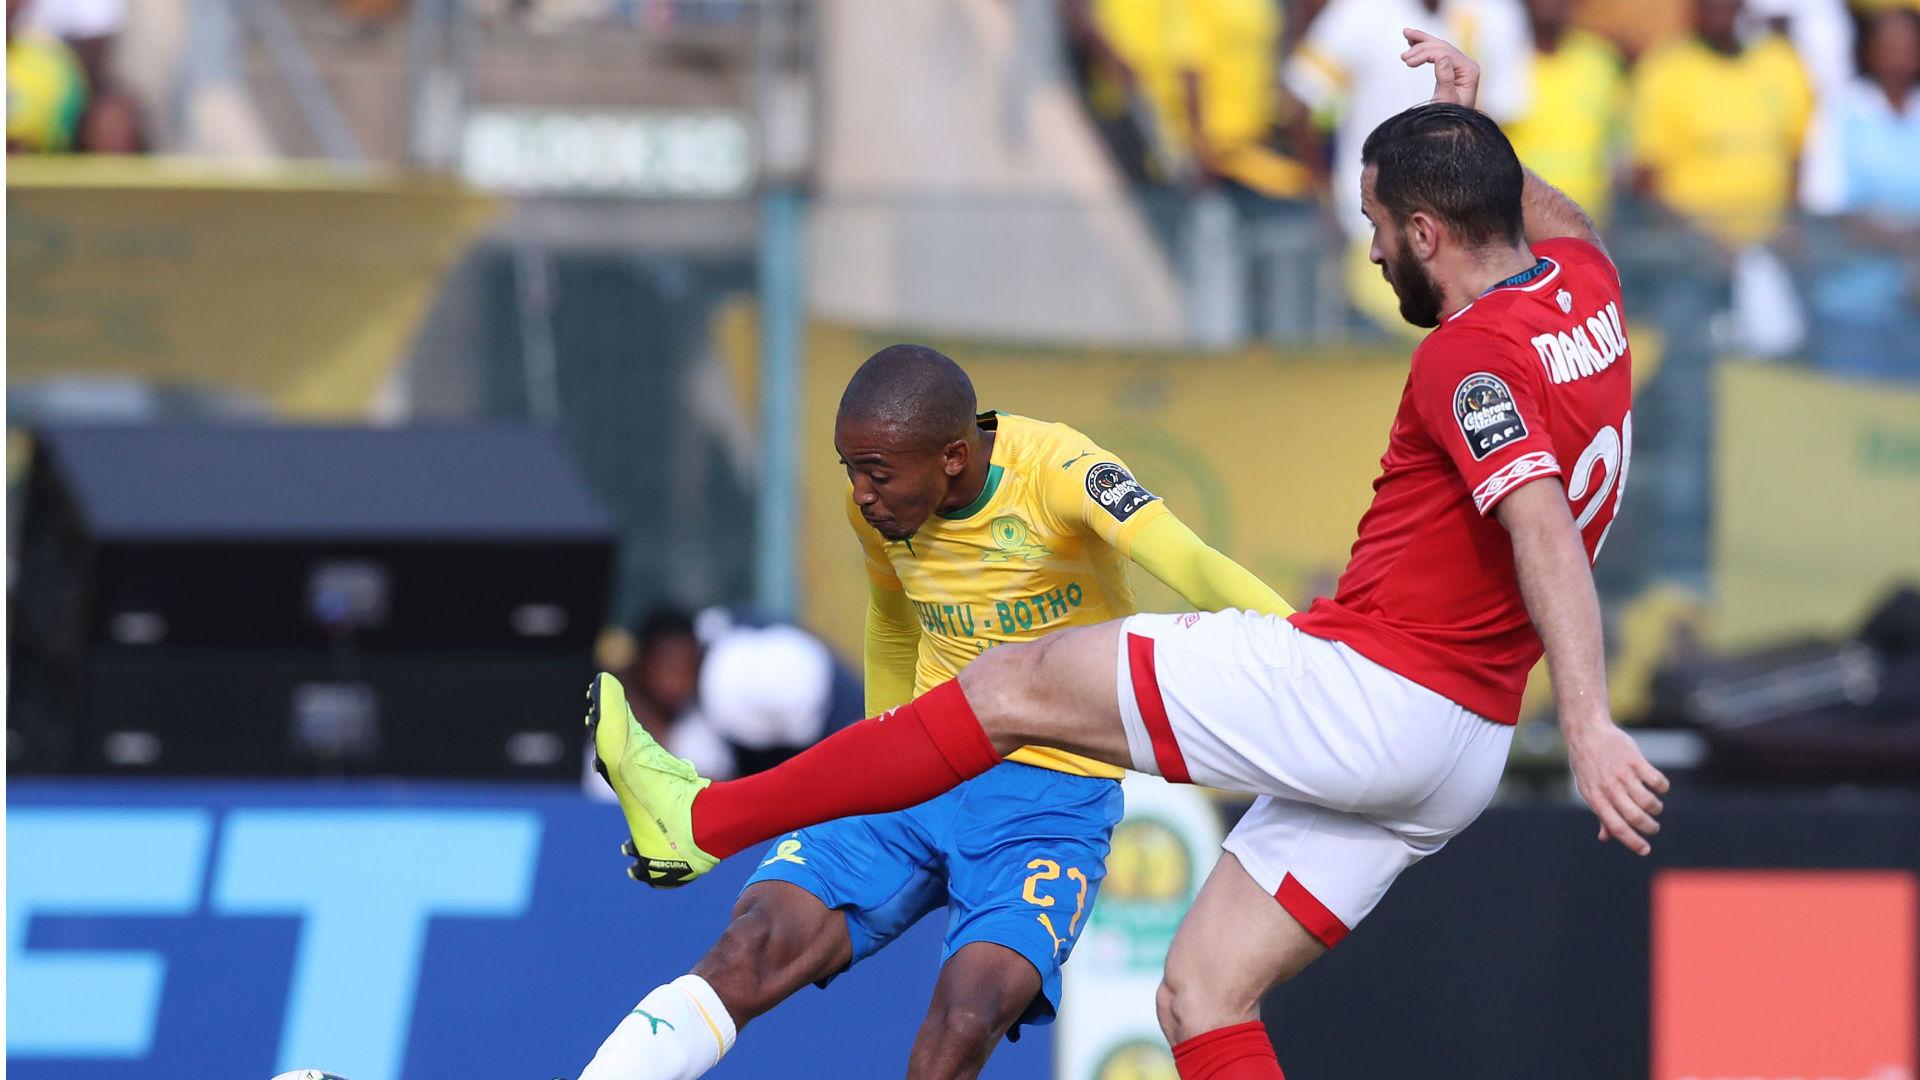 Al Ahly v Mamelodi Sundowns: Kick off, TV channel, live score, squad